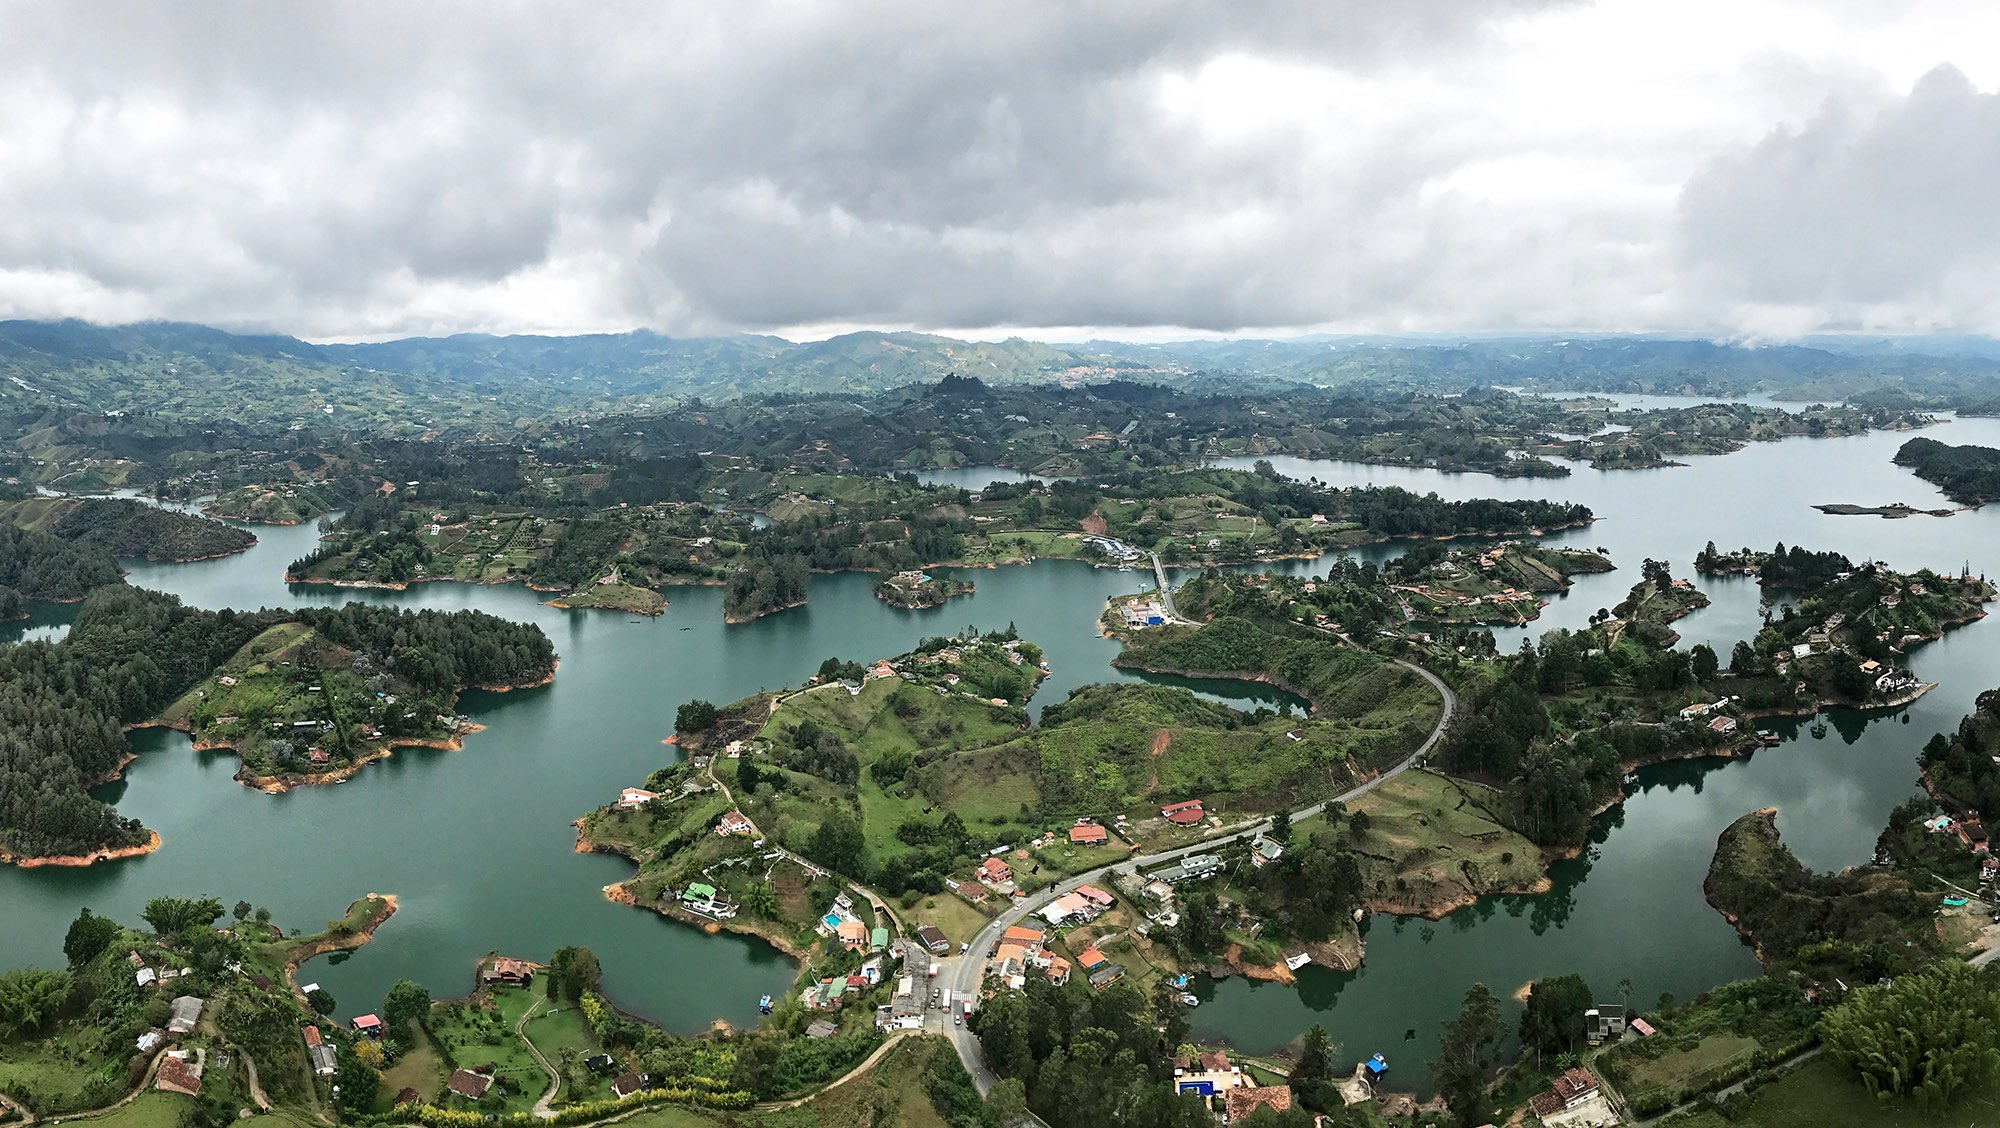 view from Piedra del Penol, Colombia